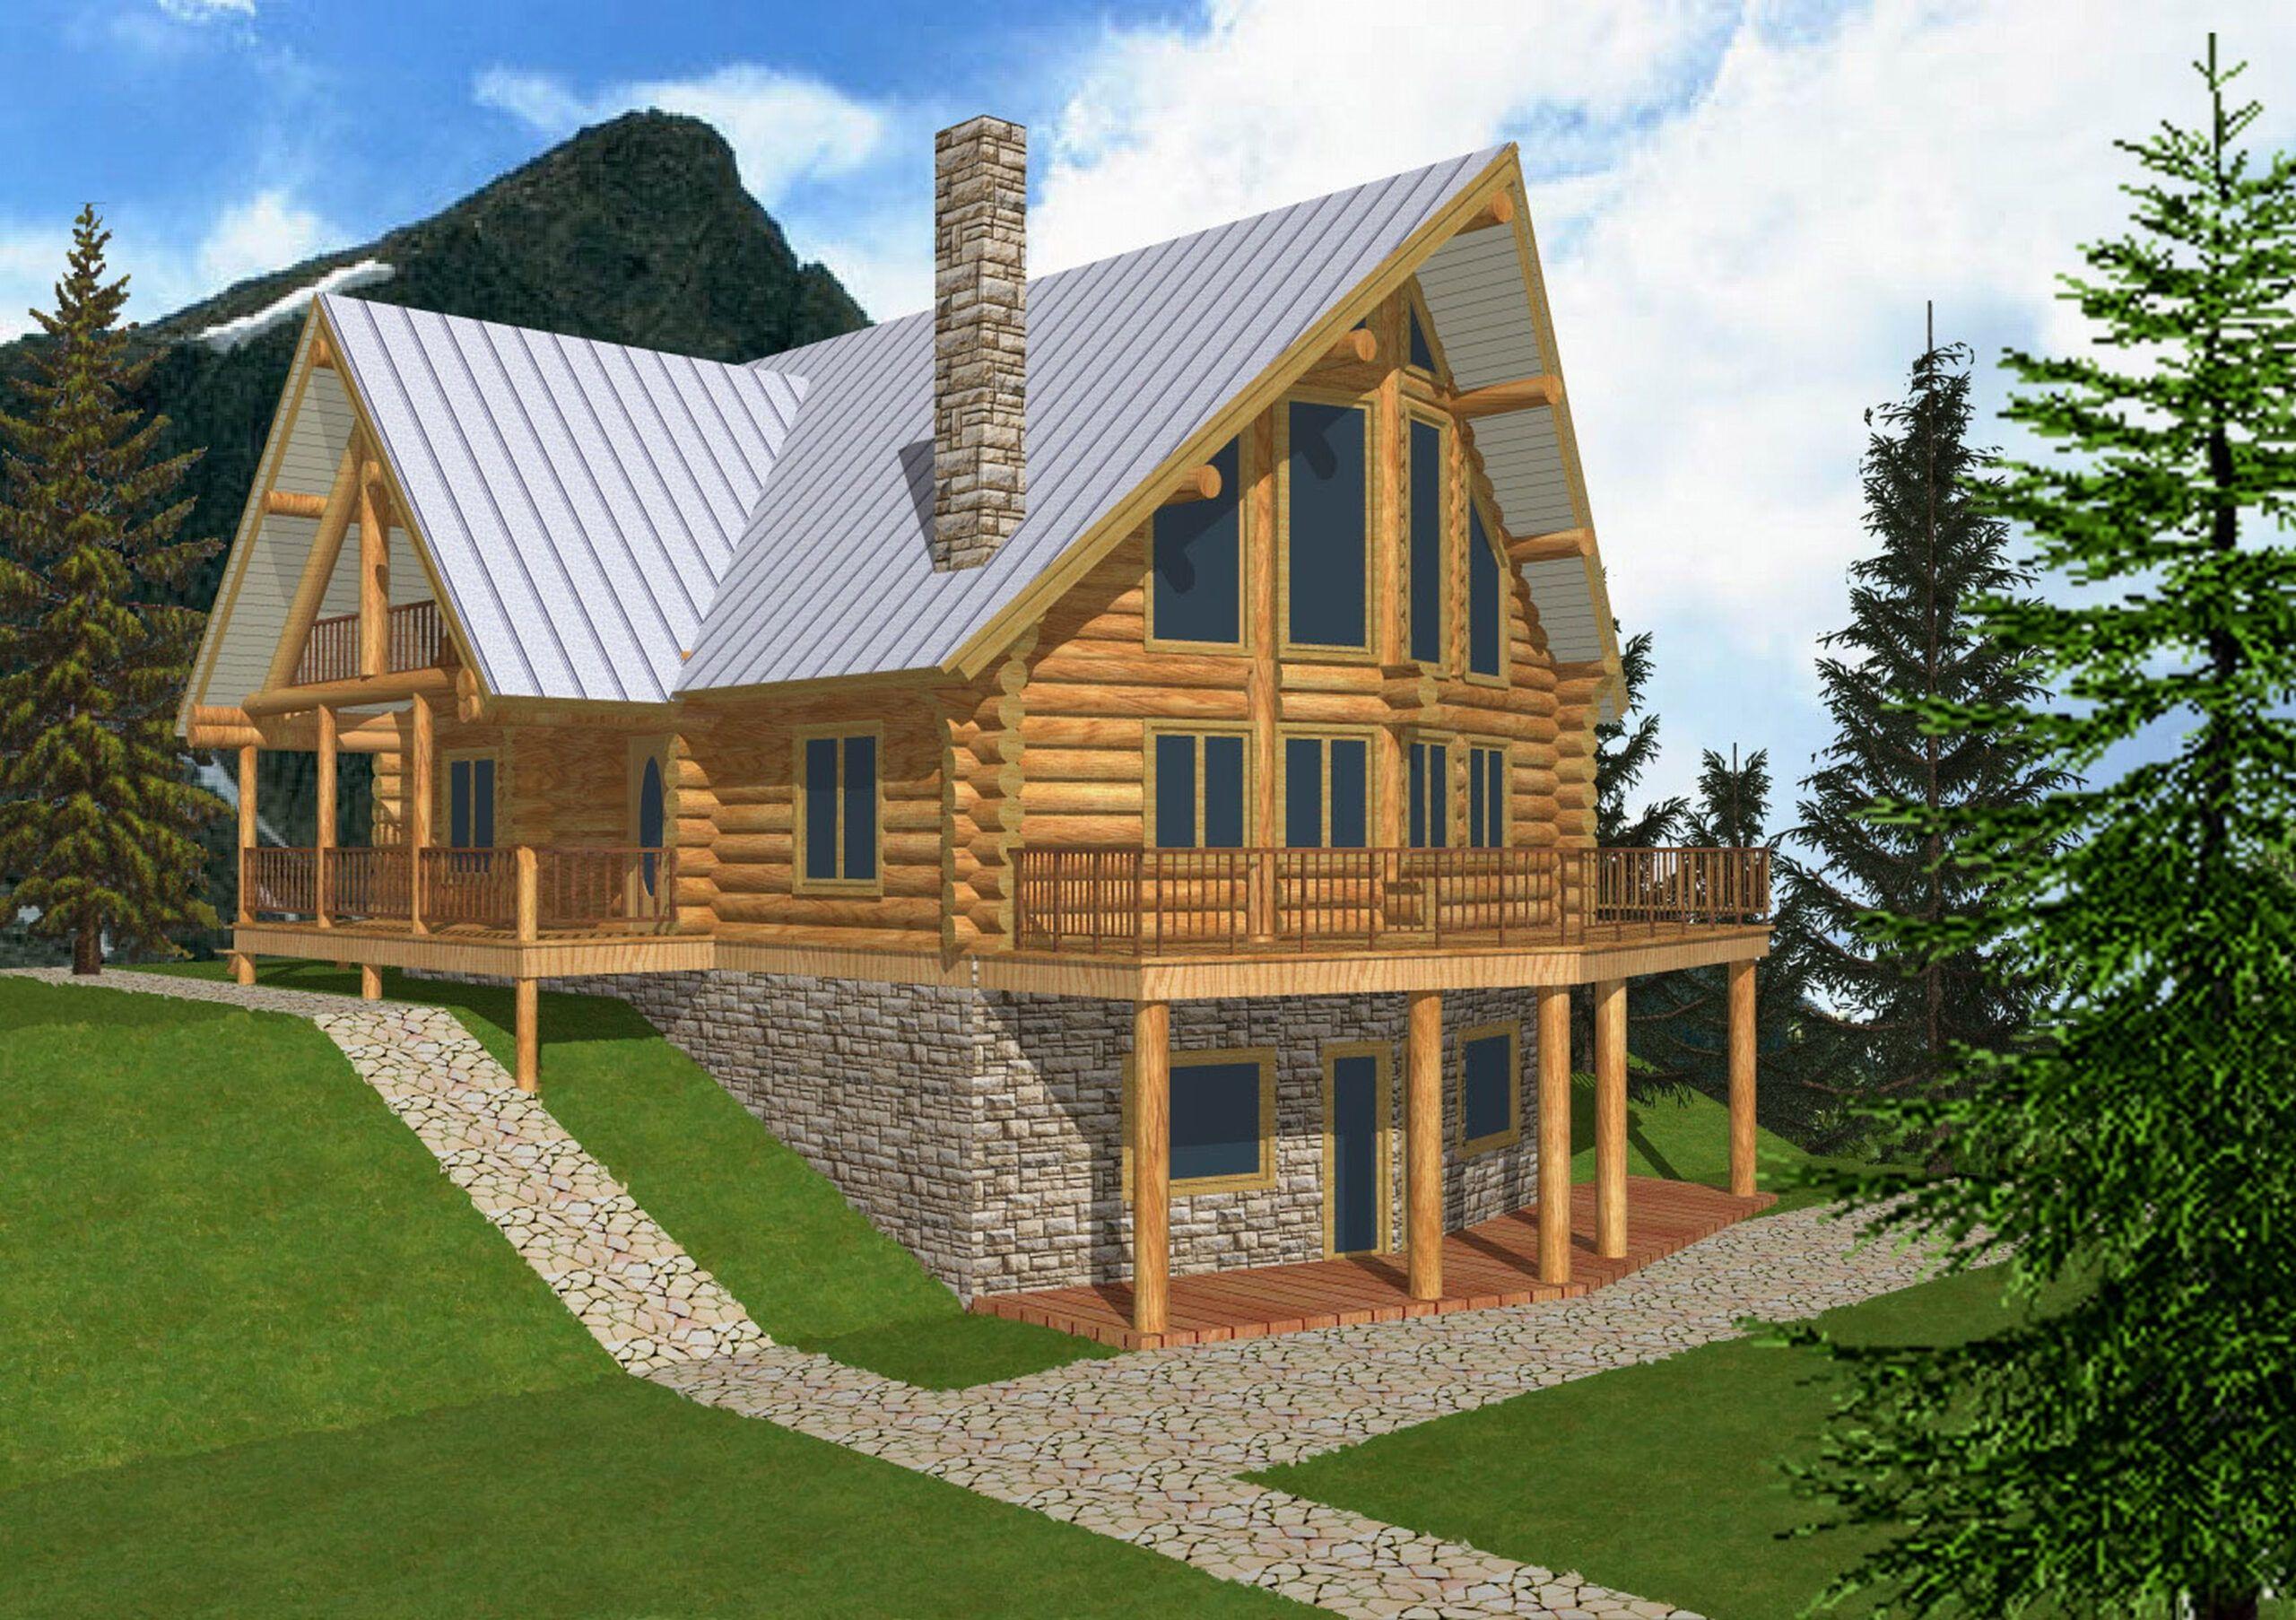 Mountain House Plans With Daylight Basement Mountain House Plans Cabin House Plans House Plan With Loft